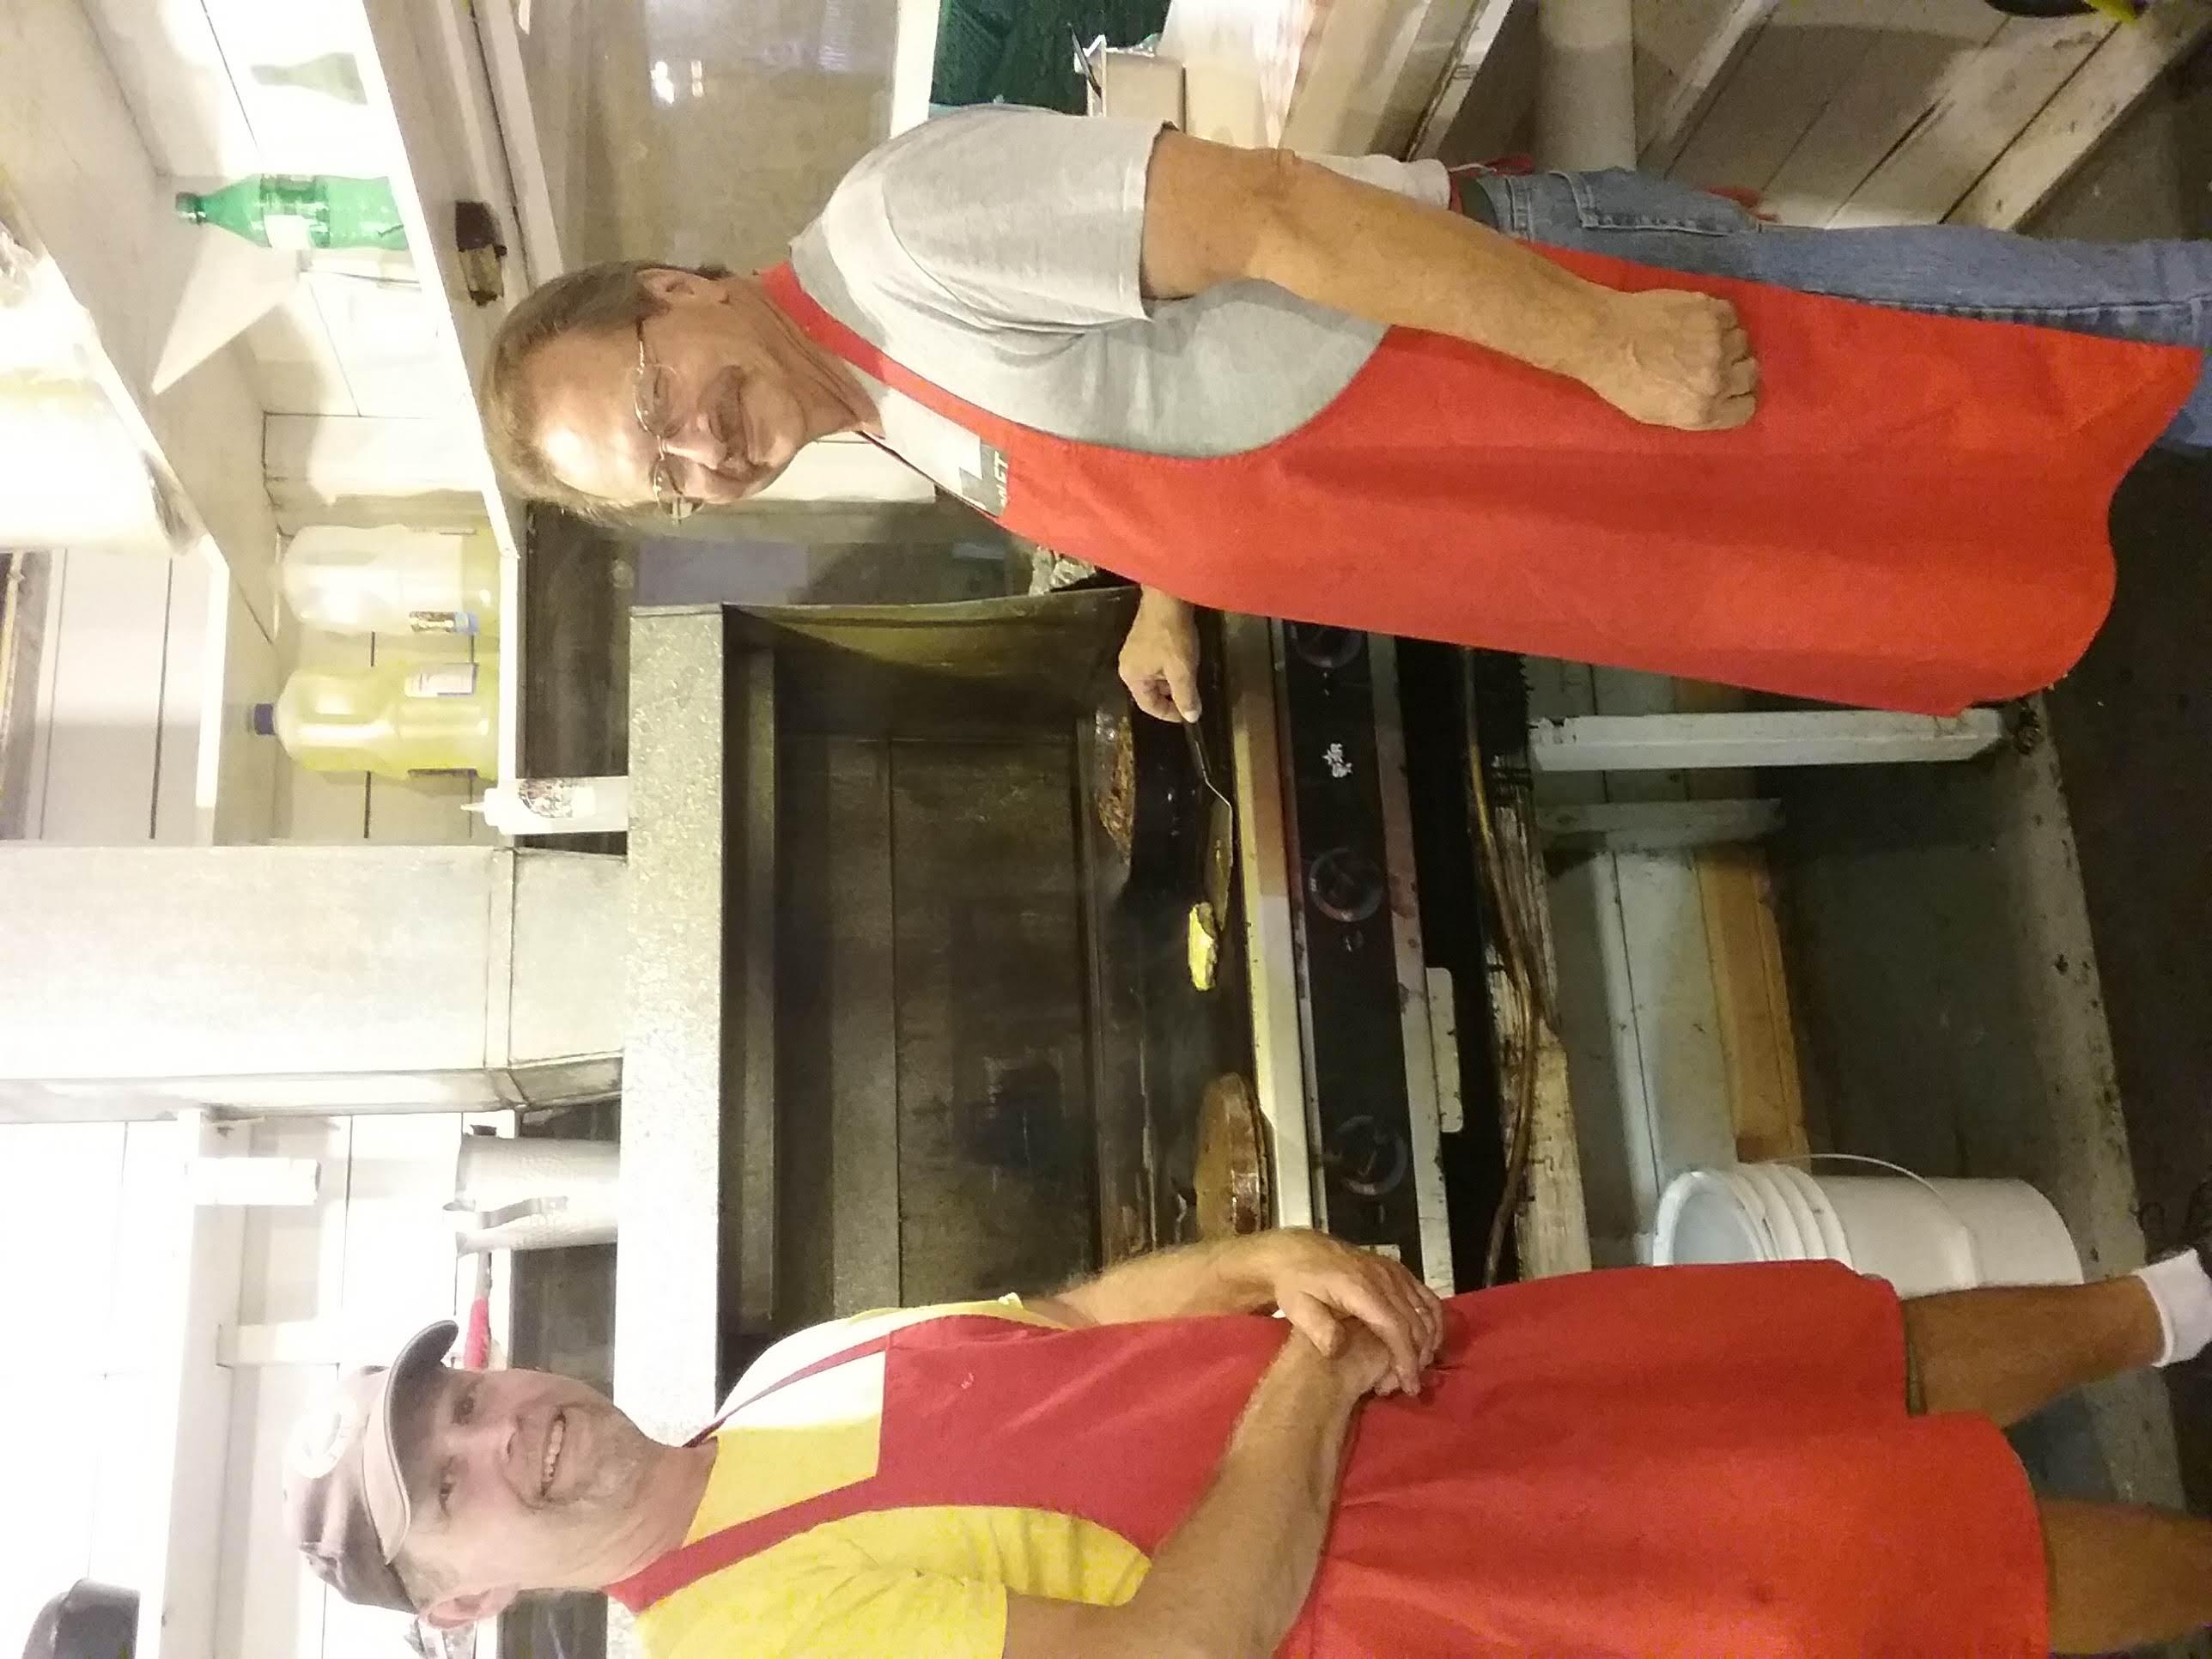 Frying Burgers